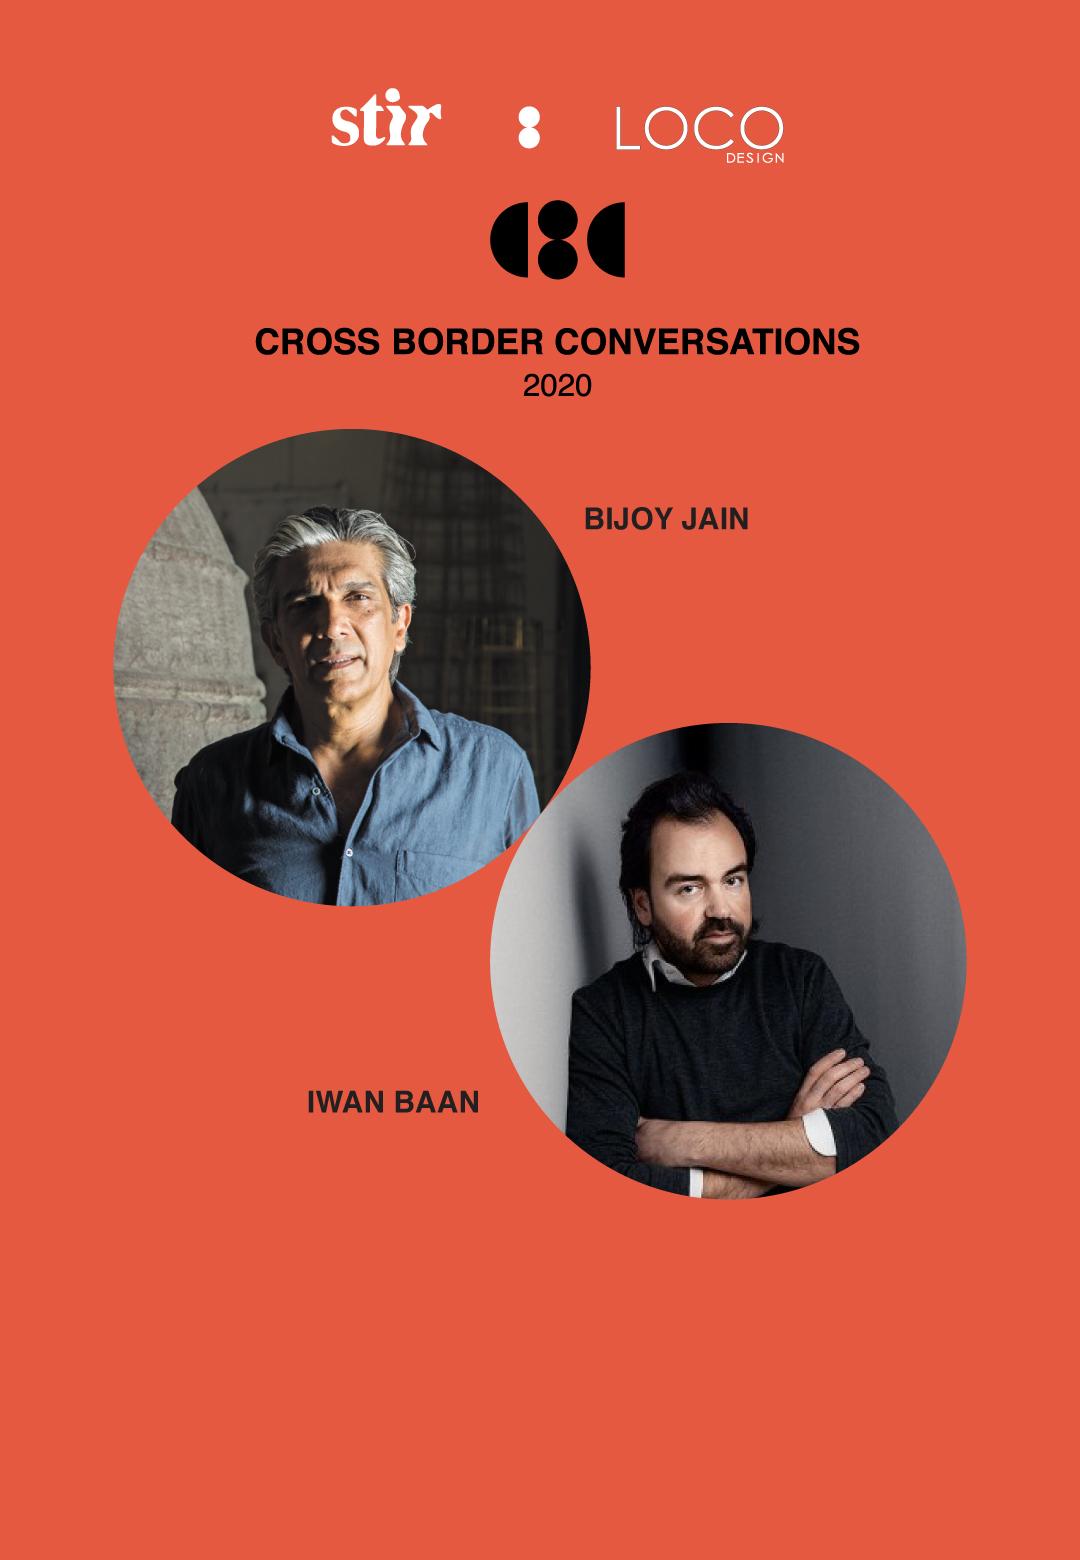 Iwan Baan X Bijoy Jain | Cross Border Conversations | STIR x LOCO Design